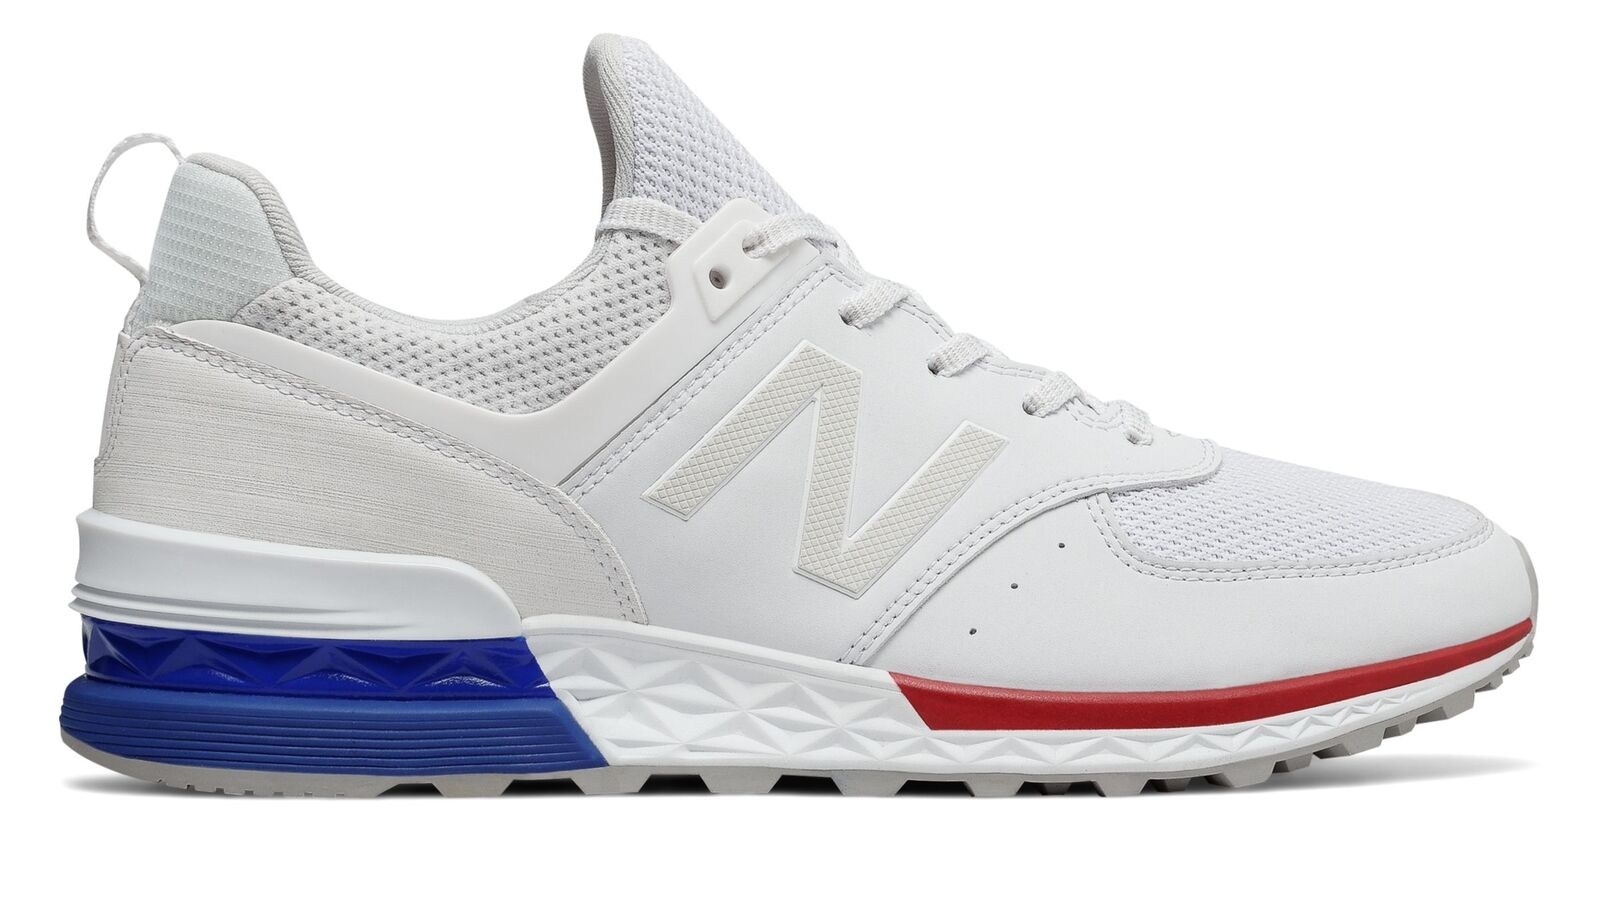 New Balance hommes 574 Sport Chaussures blanc with bleu